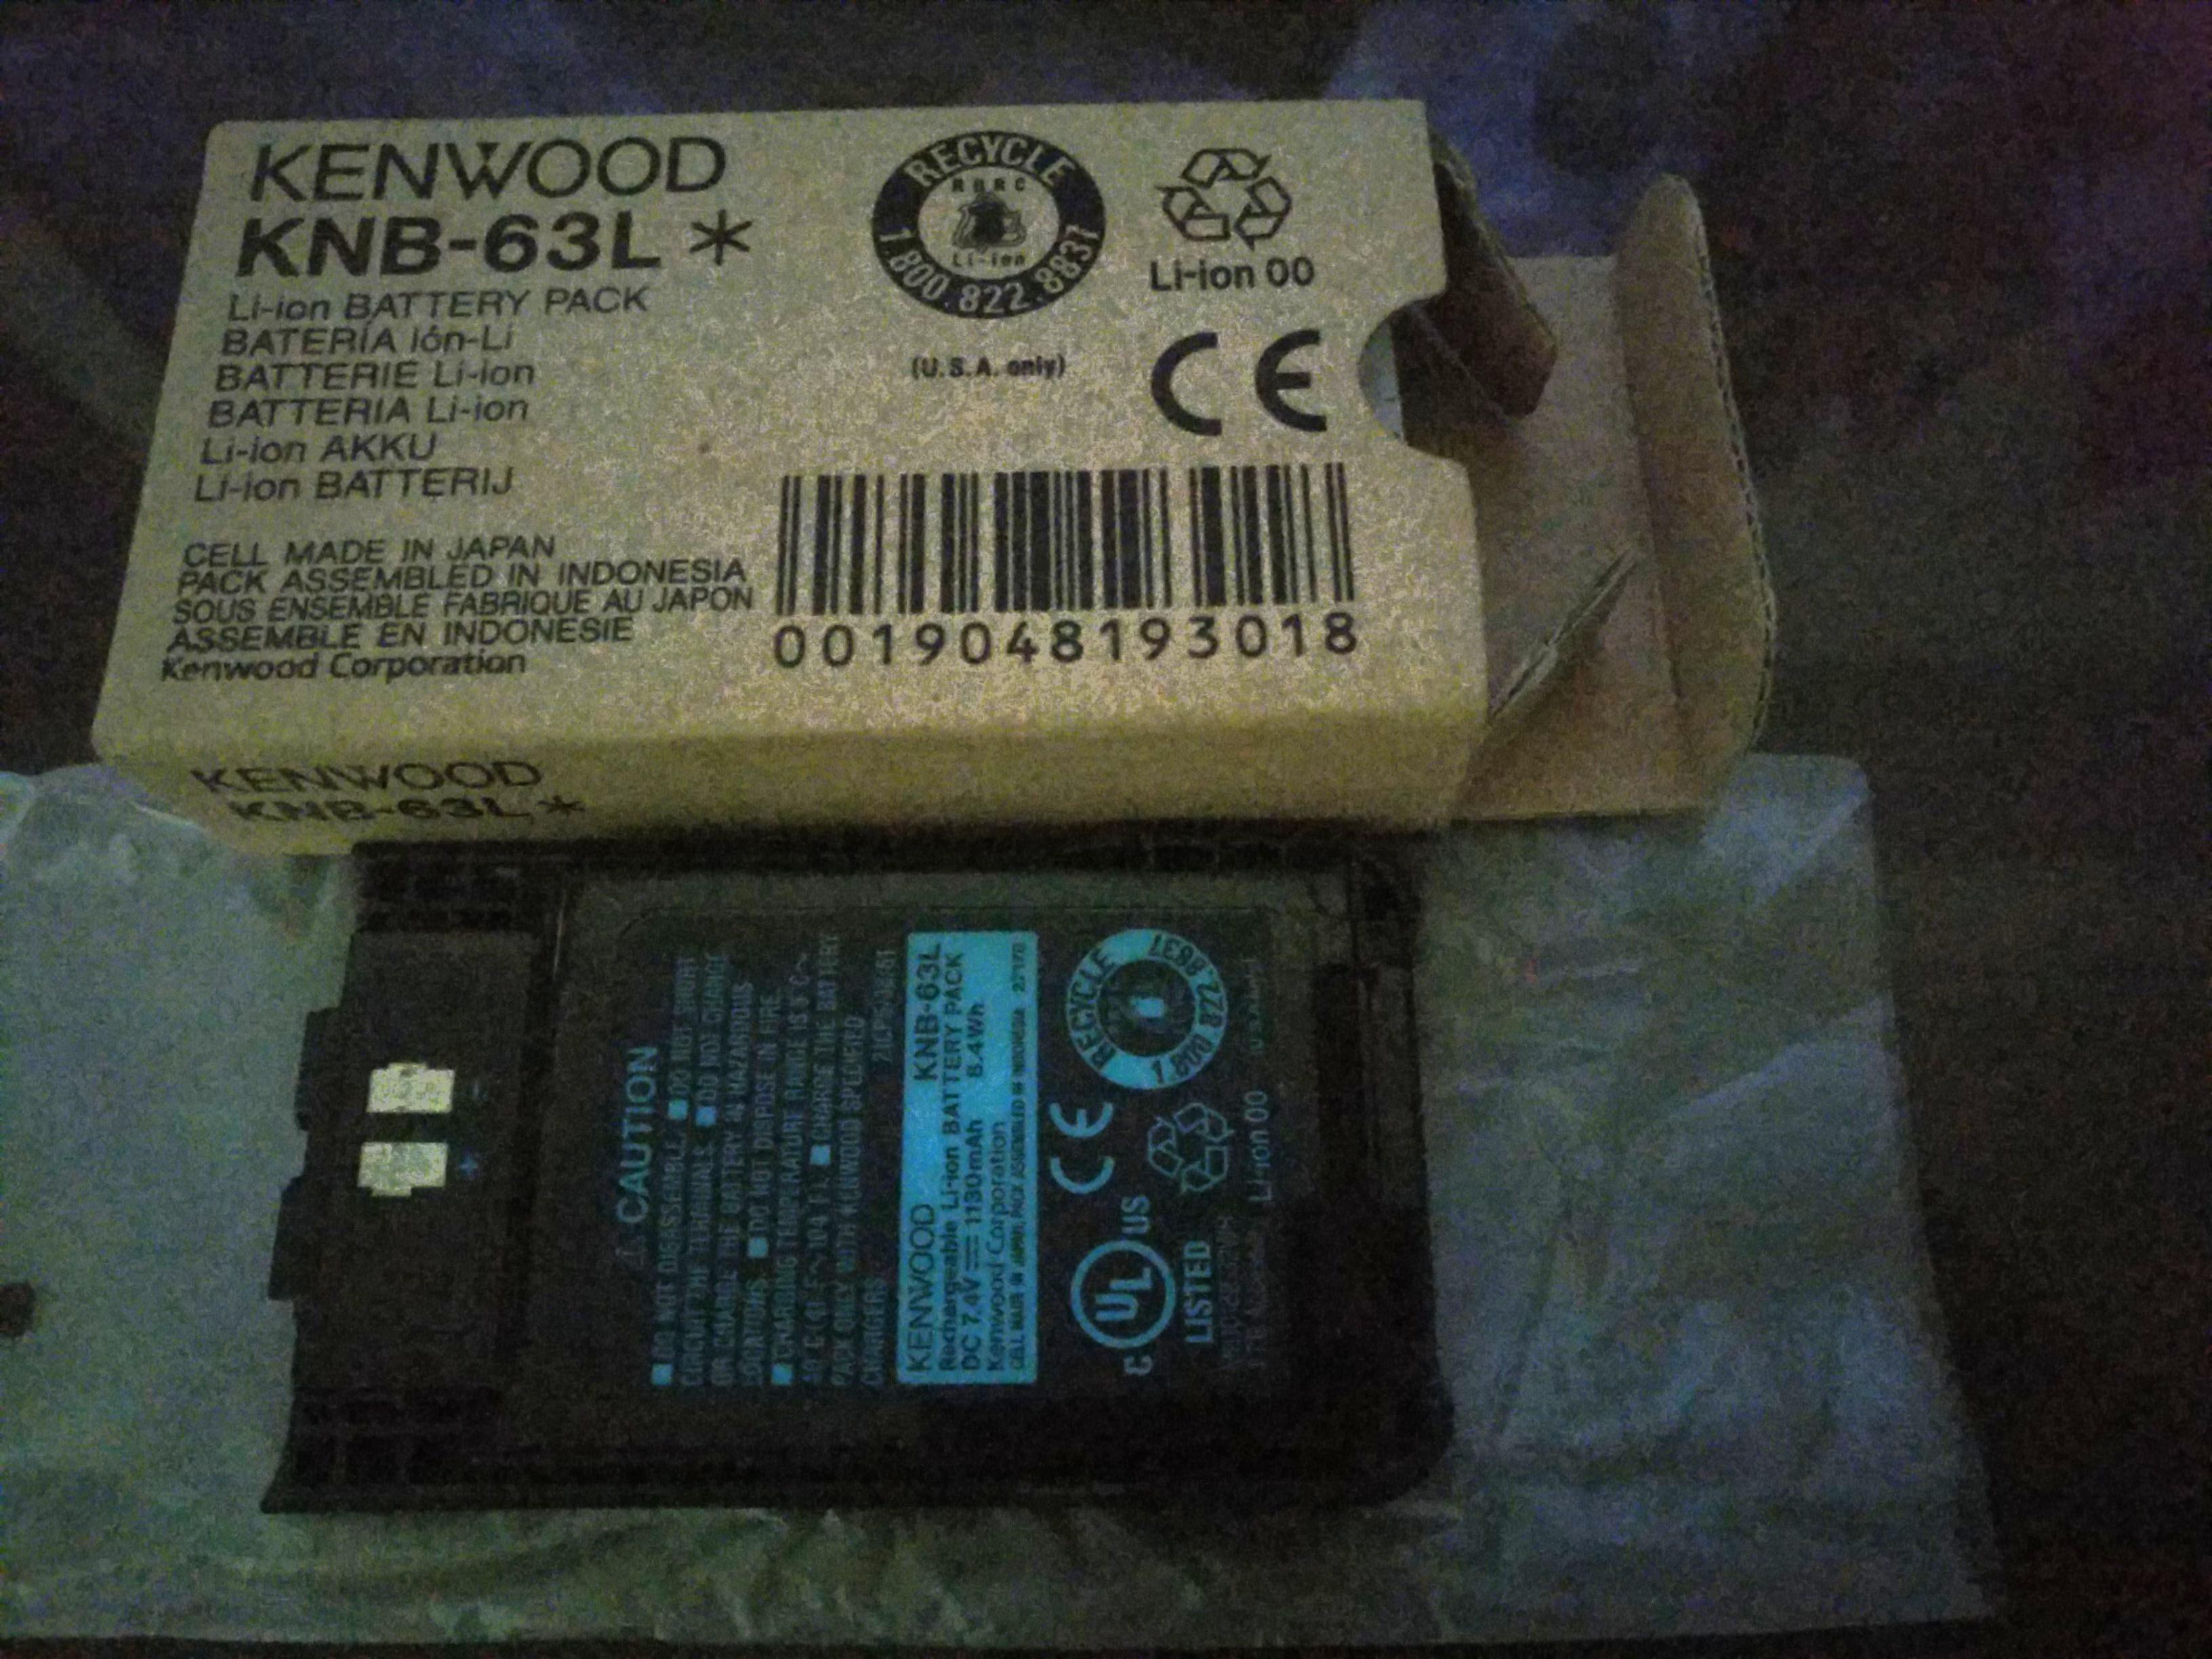 Kenwood Battery Pack KNB-63L